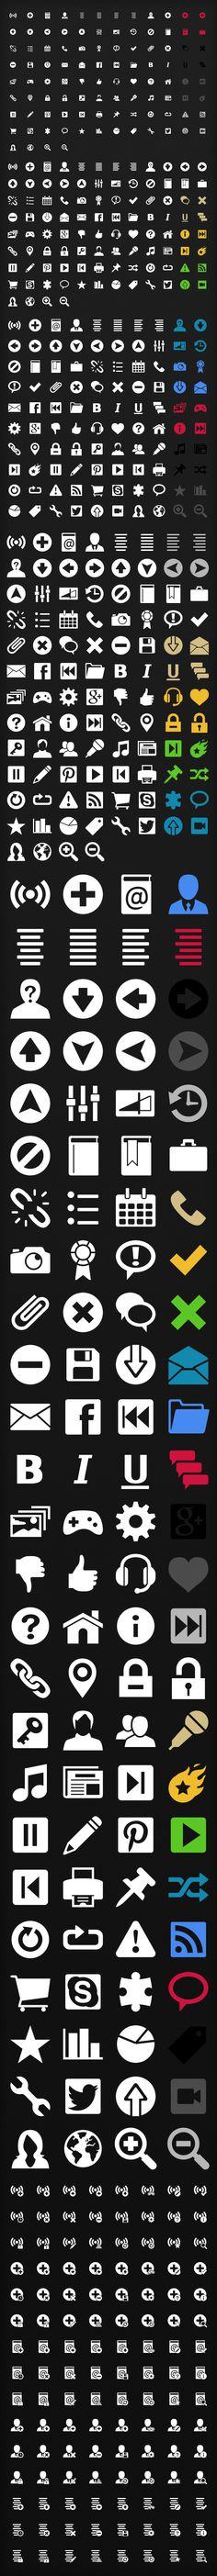 Iphone web icons